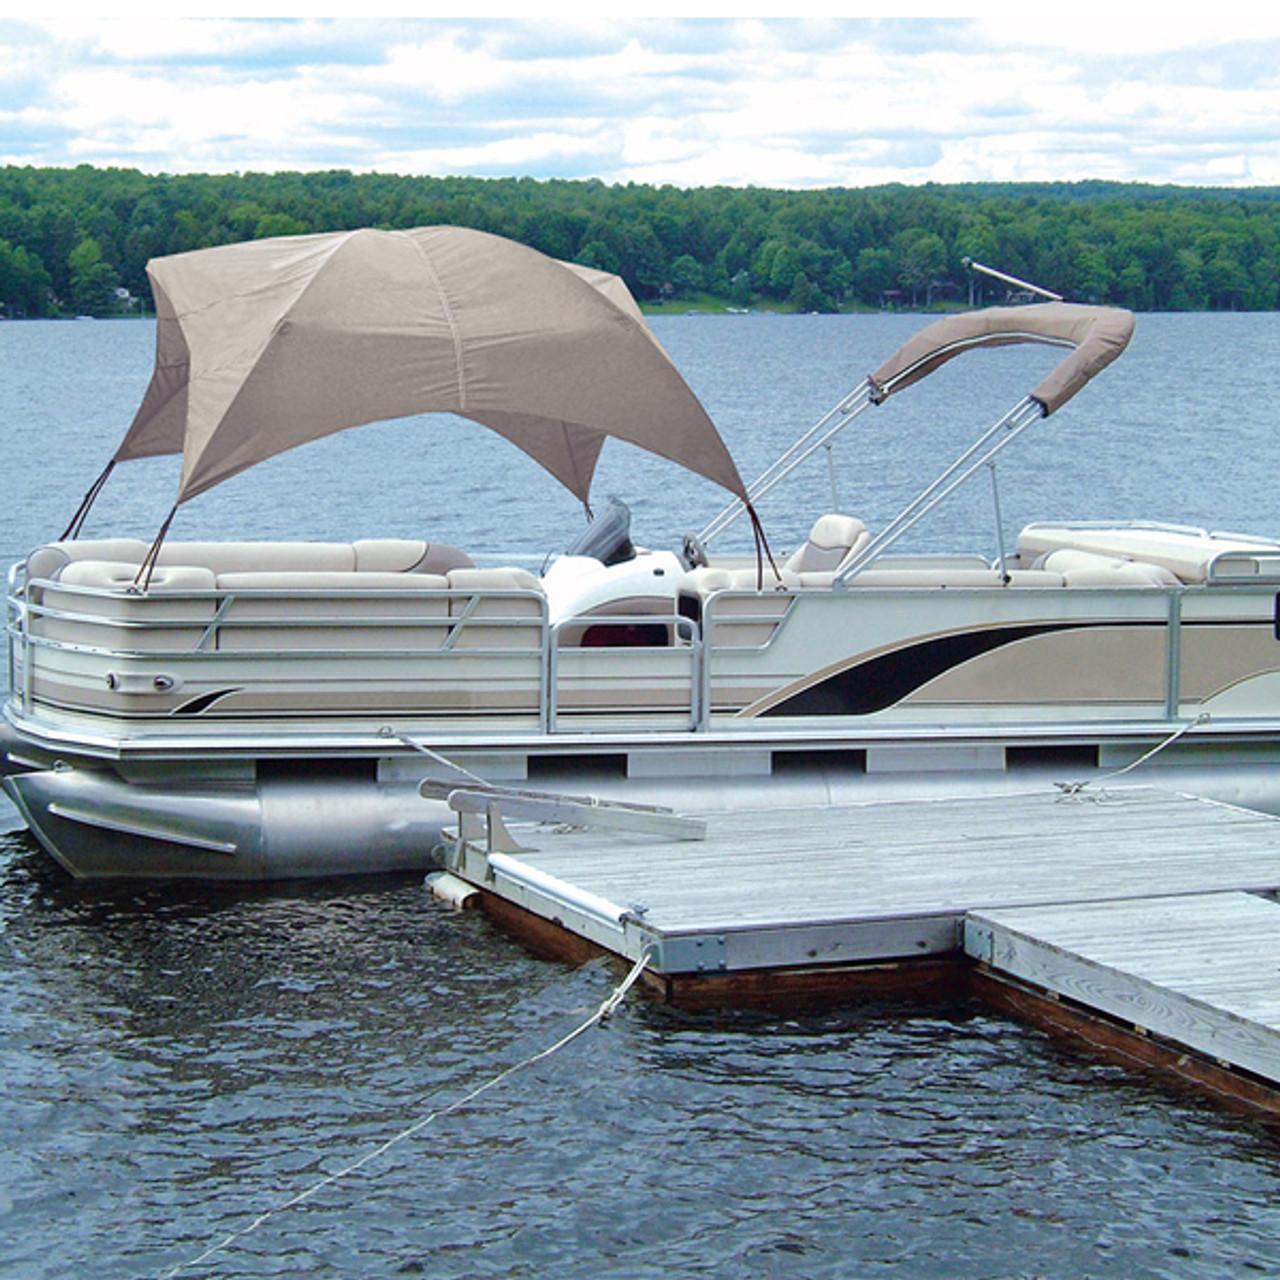 taylor made pontoon gazebo shade wholesale marine wiring diagram sun shade boat canopy tops johnson outboard wiring [ 1280 x 1280 Pixel ]